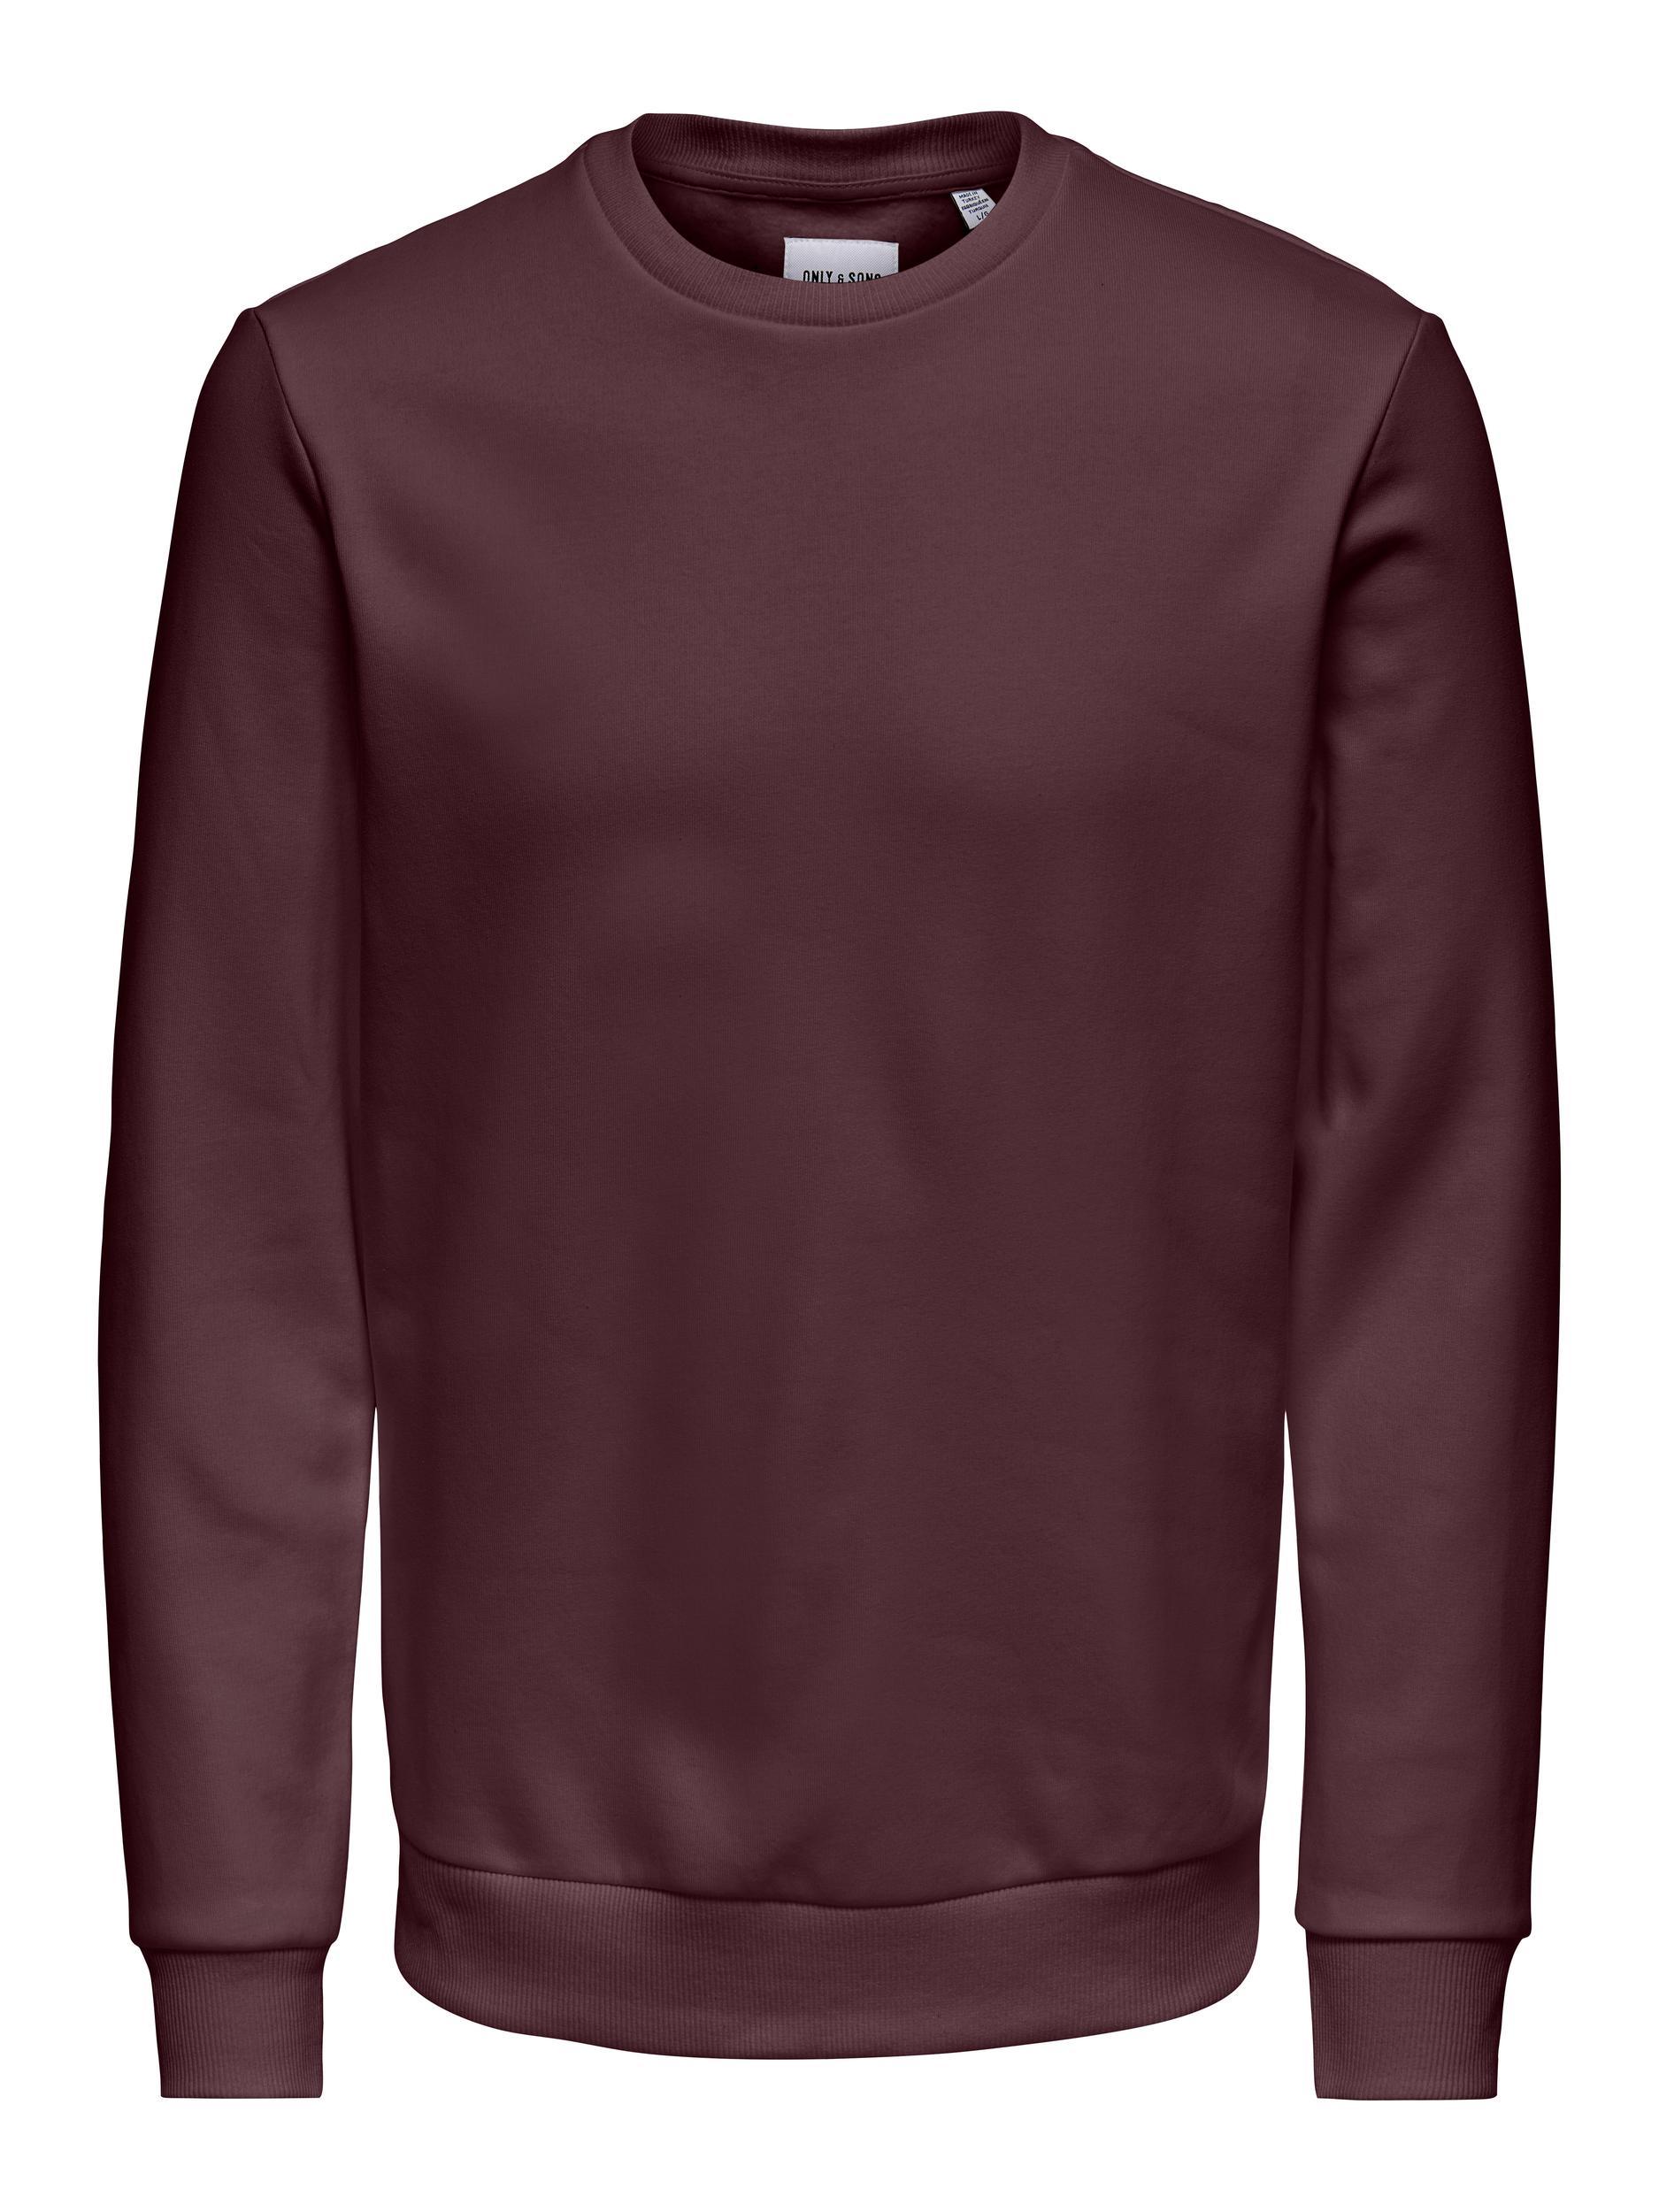 Only & Sons Ceres Life Crew Neck sweatshirt, fudge, large